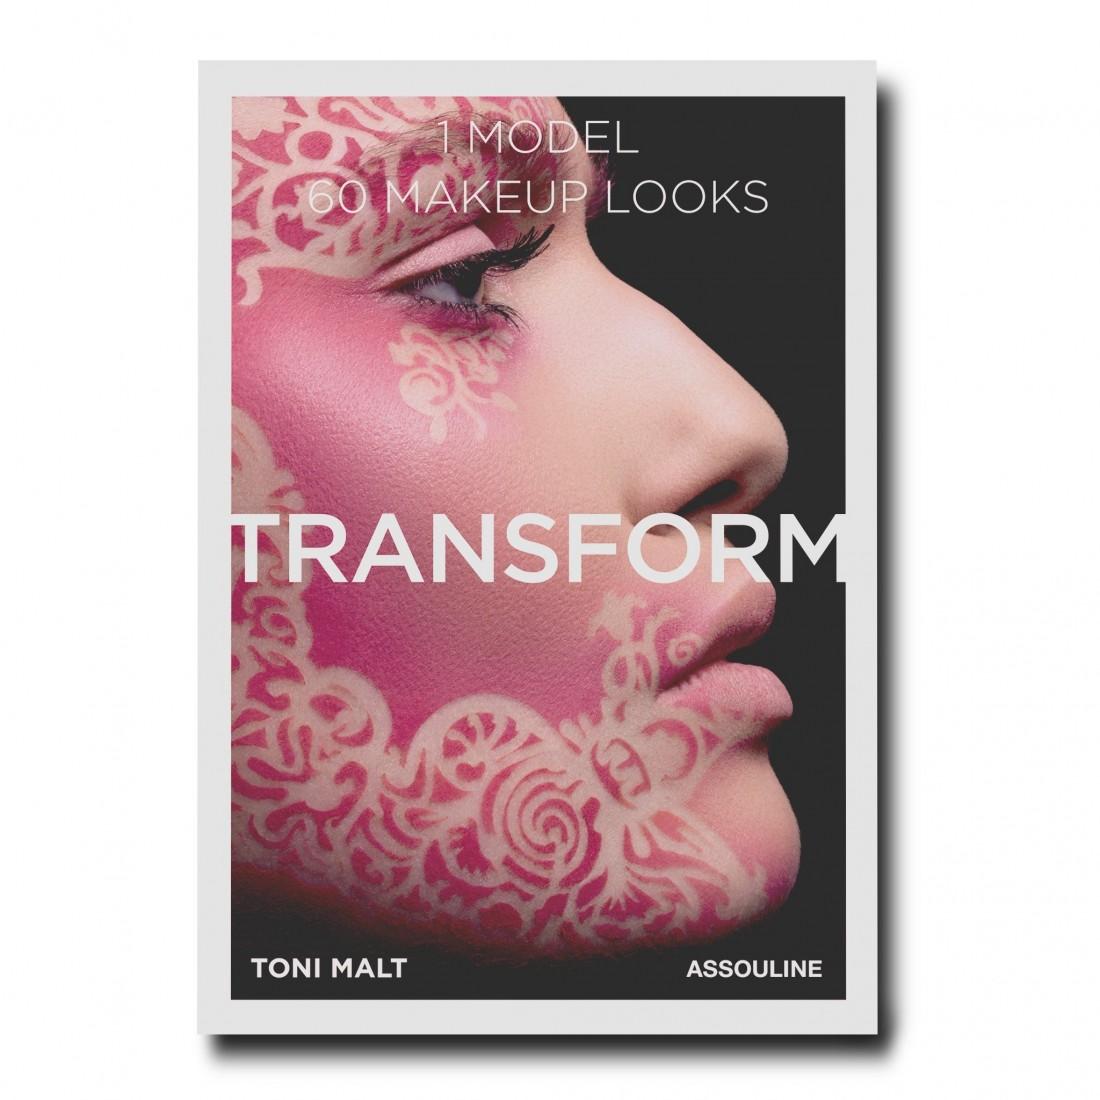 Livre Toni Malt Makeup: Transform 60 Makeup looks Assouline